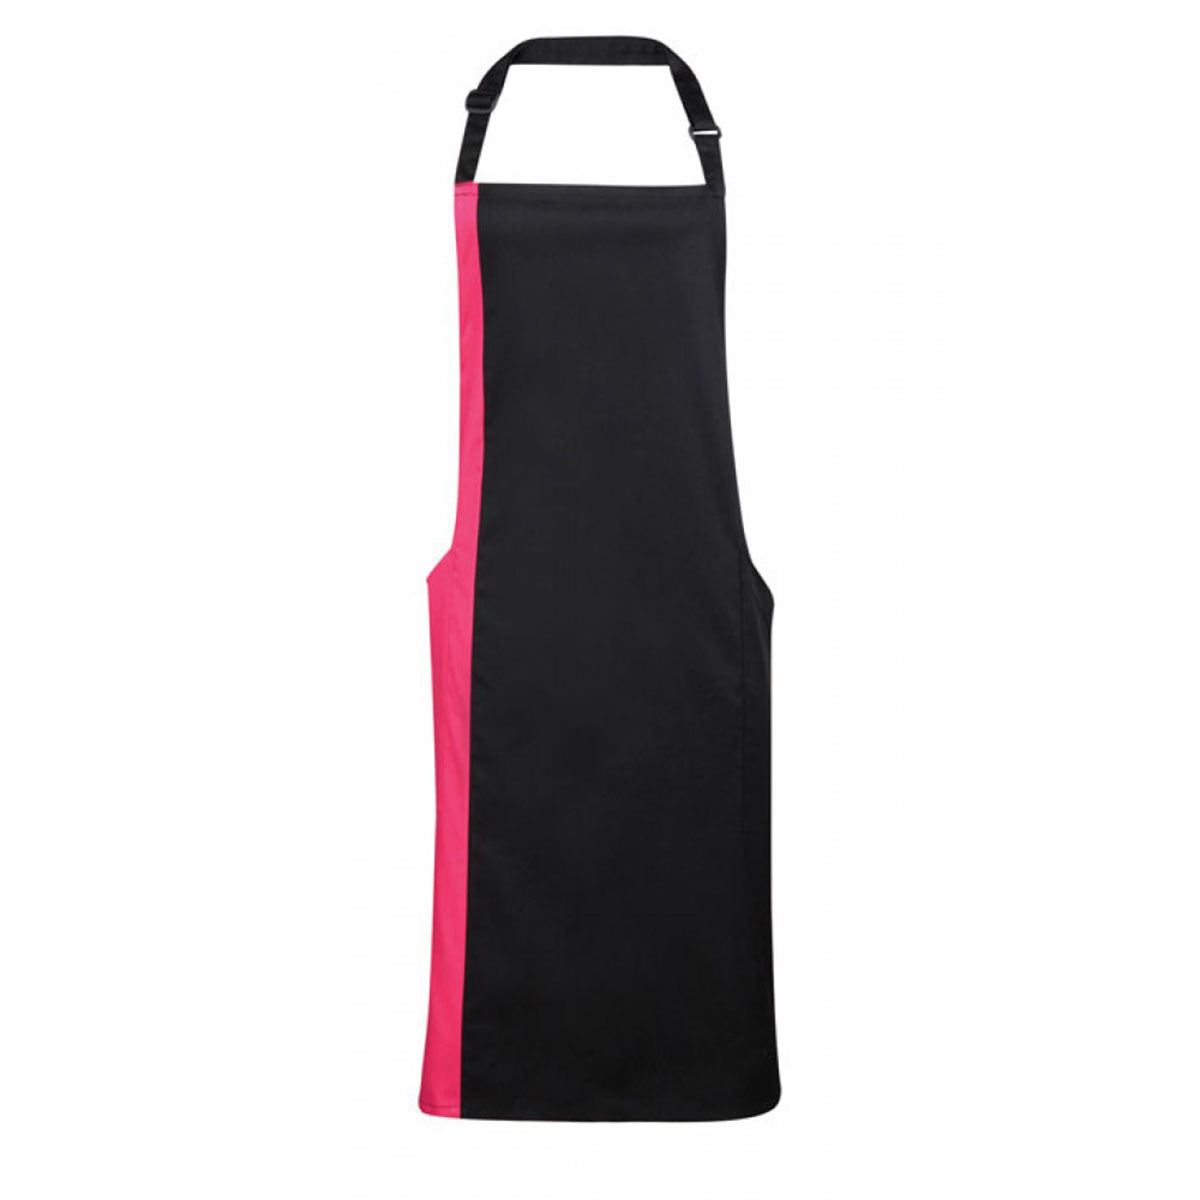 Contrast Bib Apron - pr162-black-hot-pink